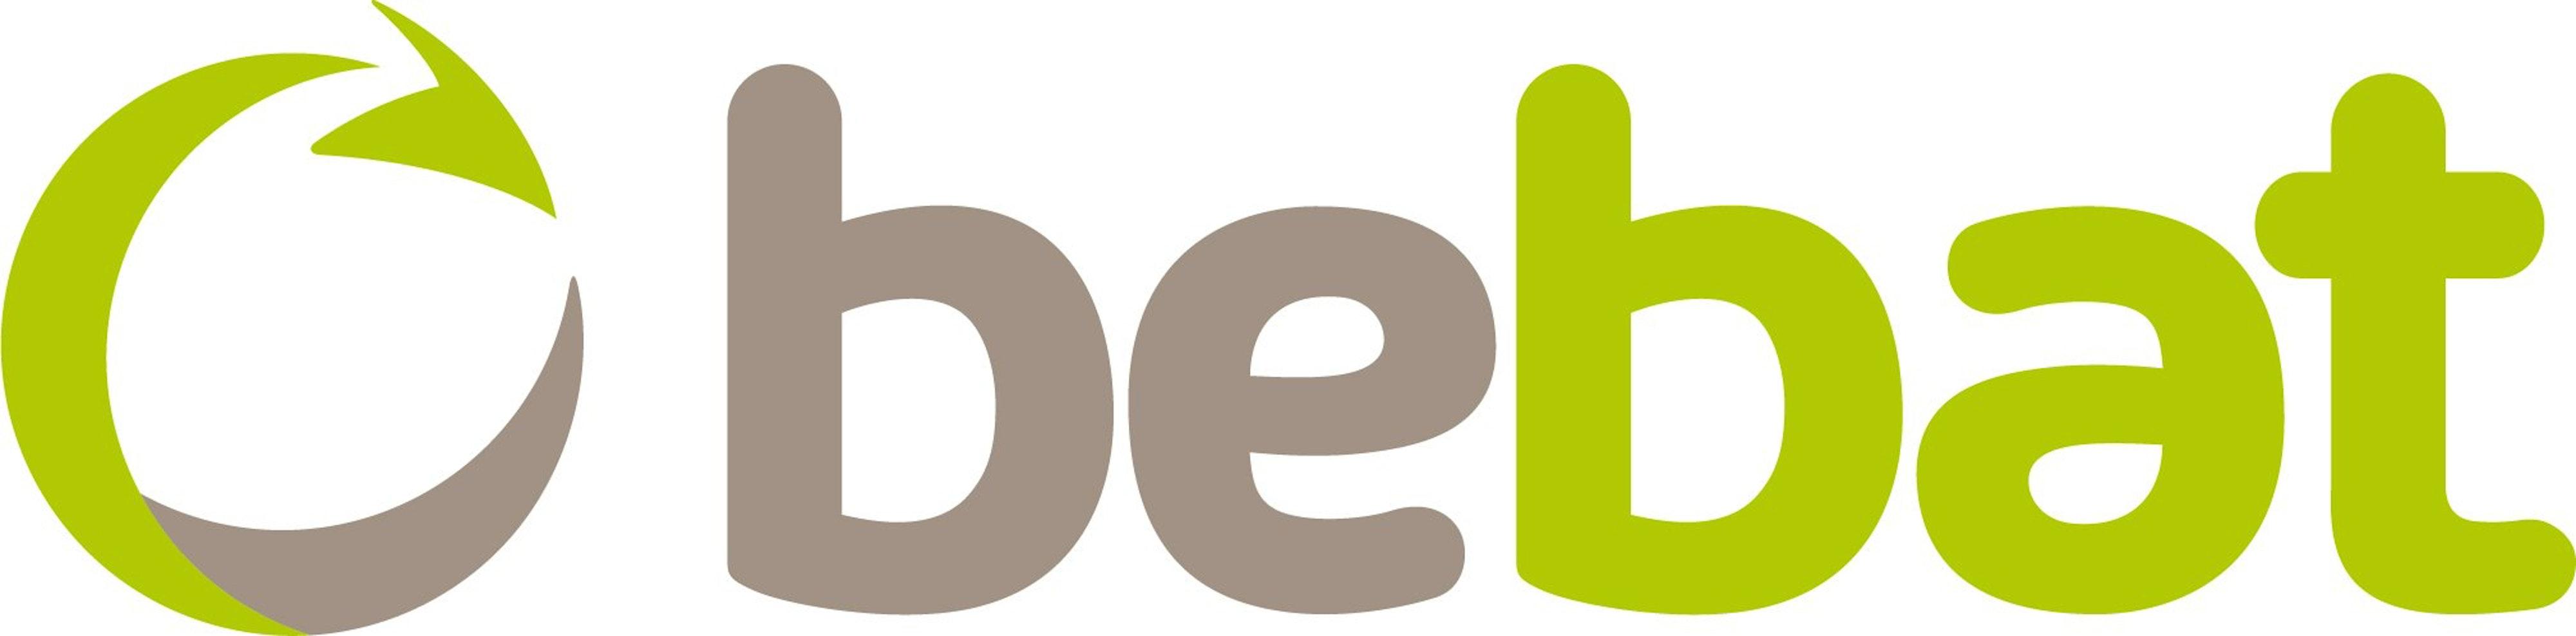 Bebat logo